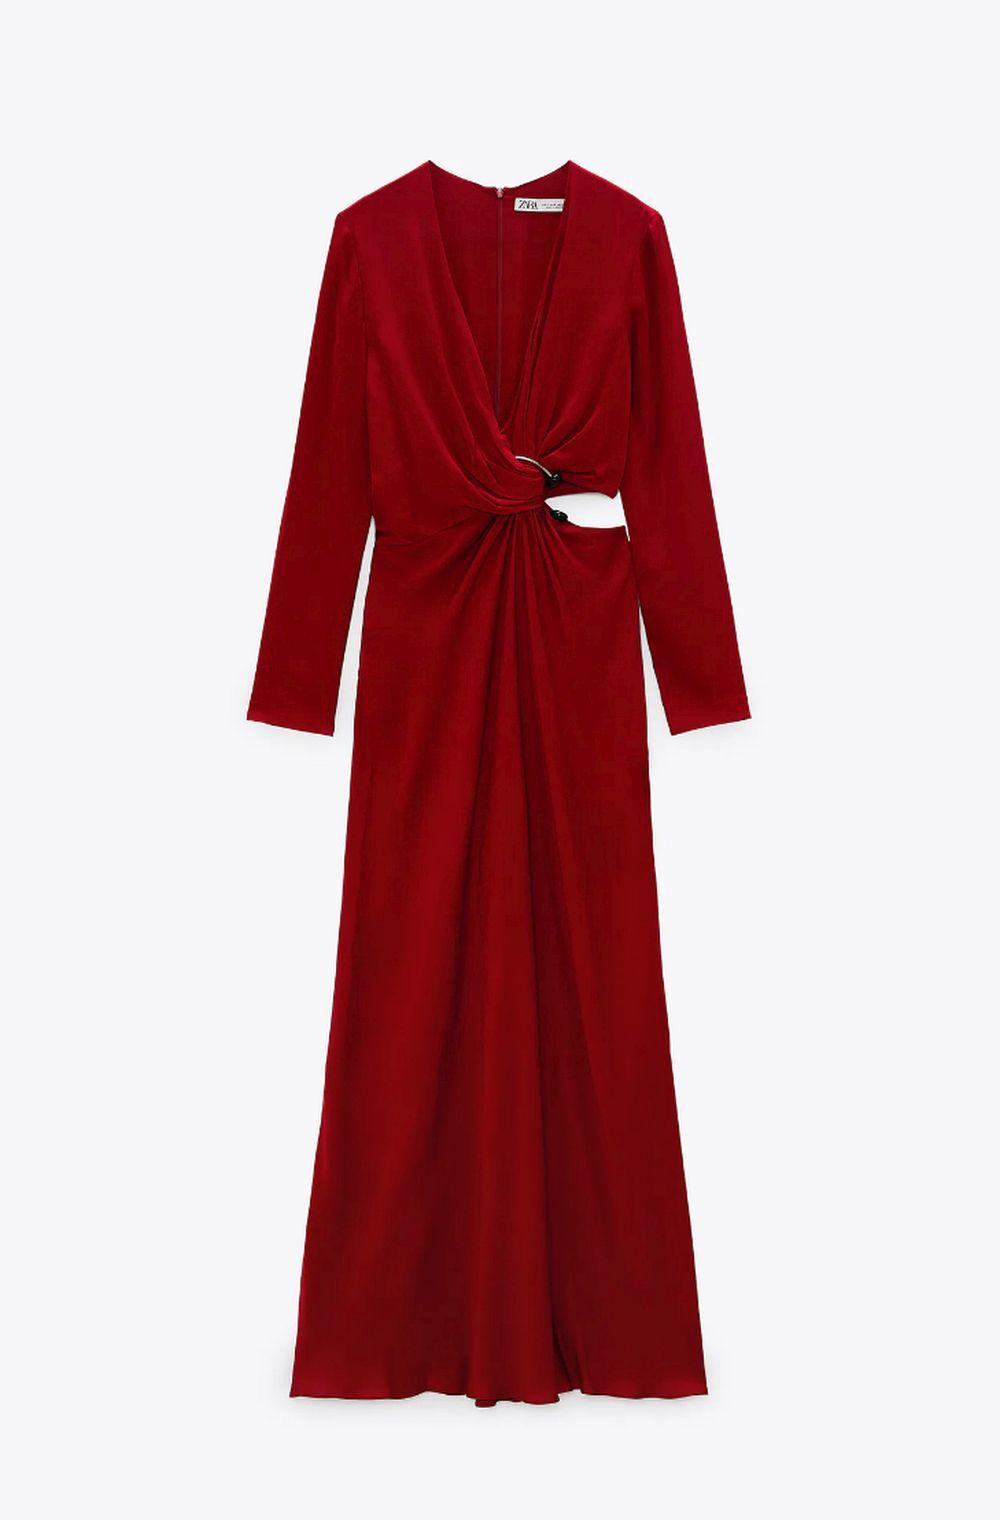 Vestido cut out de Zara.